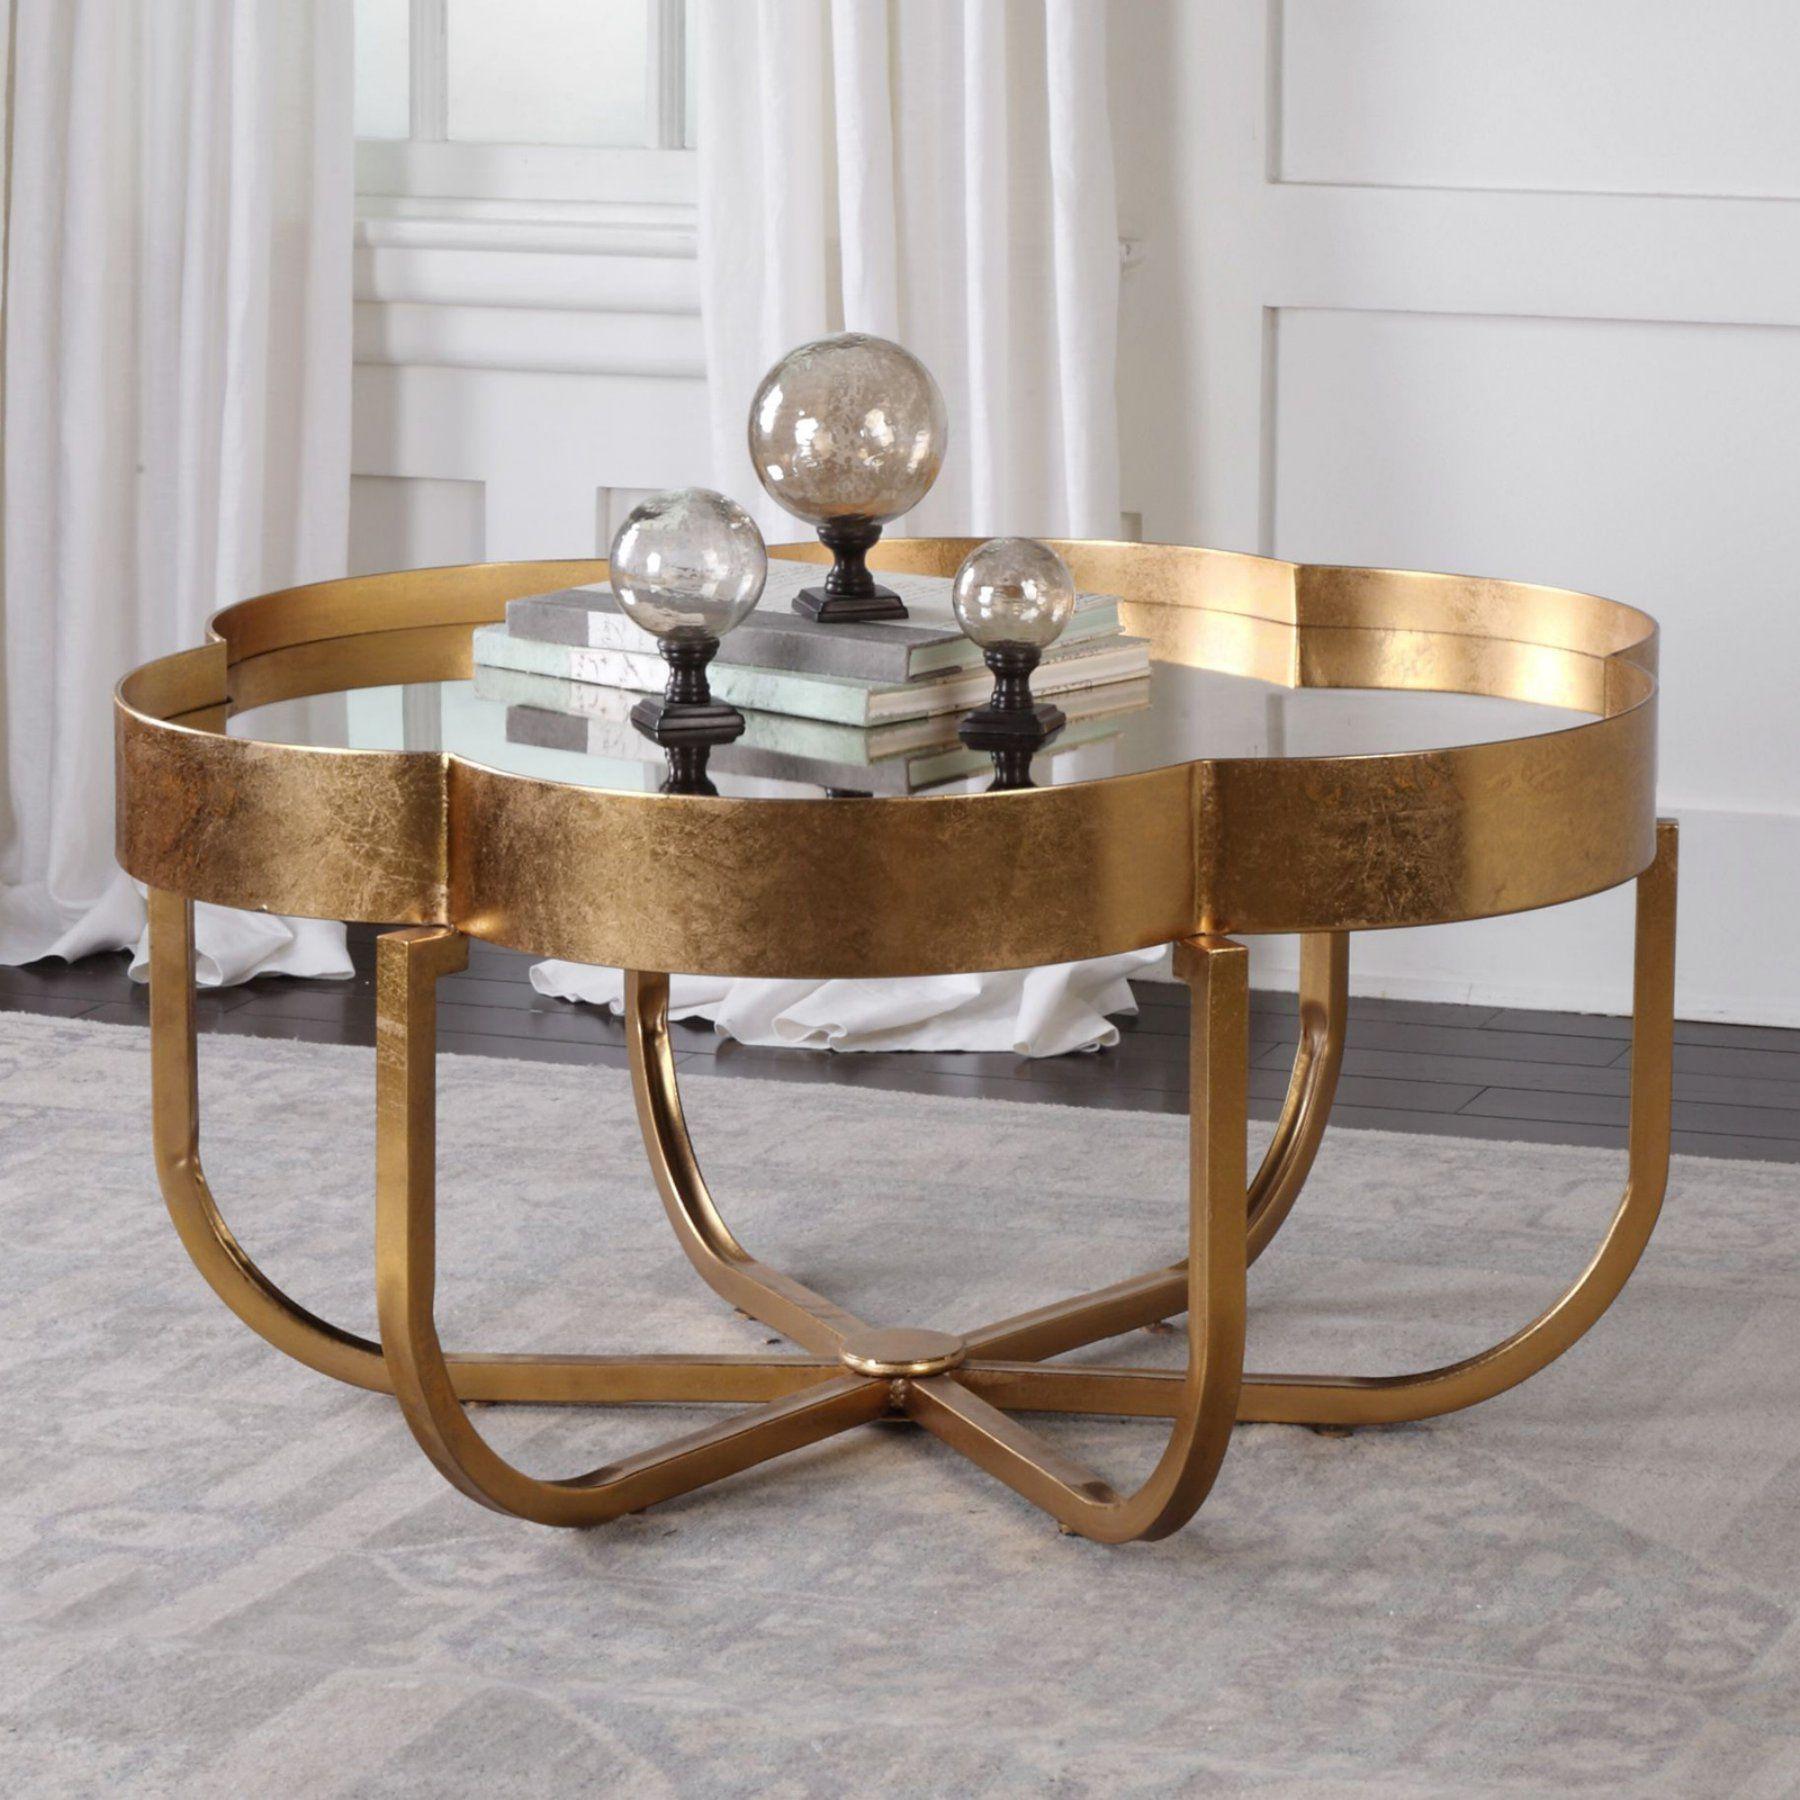 uttermost cydney gold coffee table 24739 products pinterest rh pinterest co uk